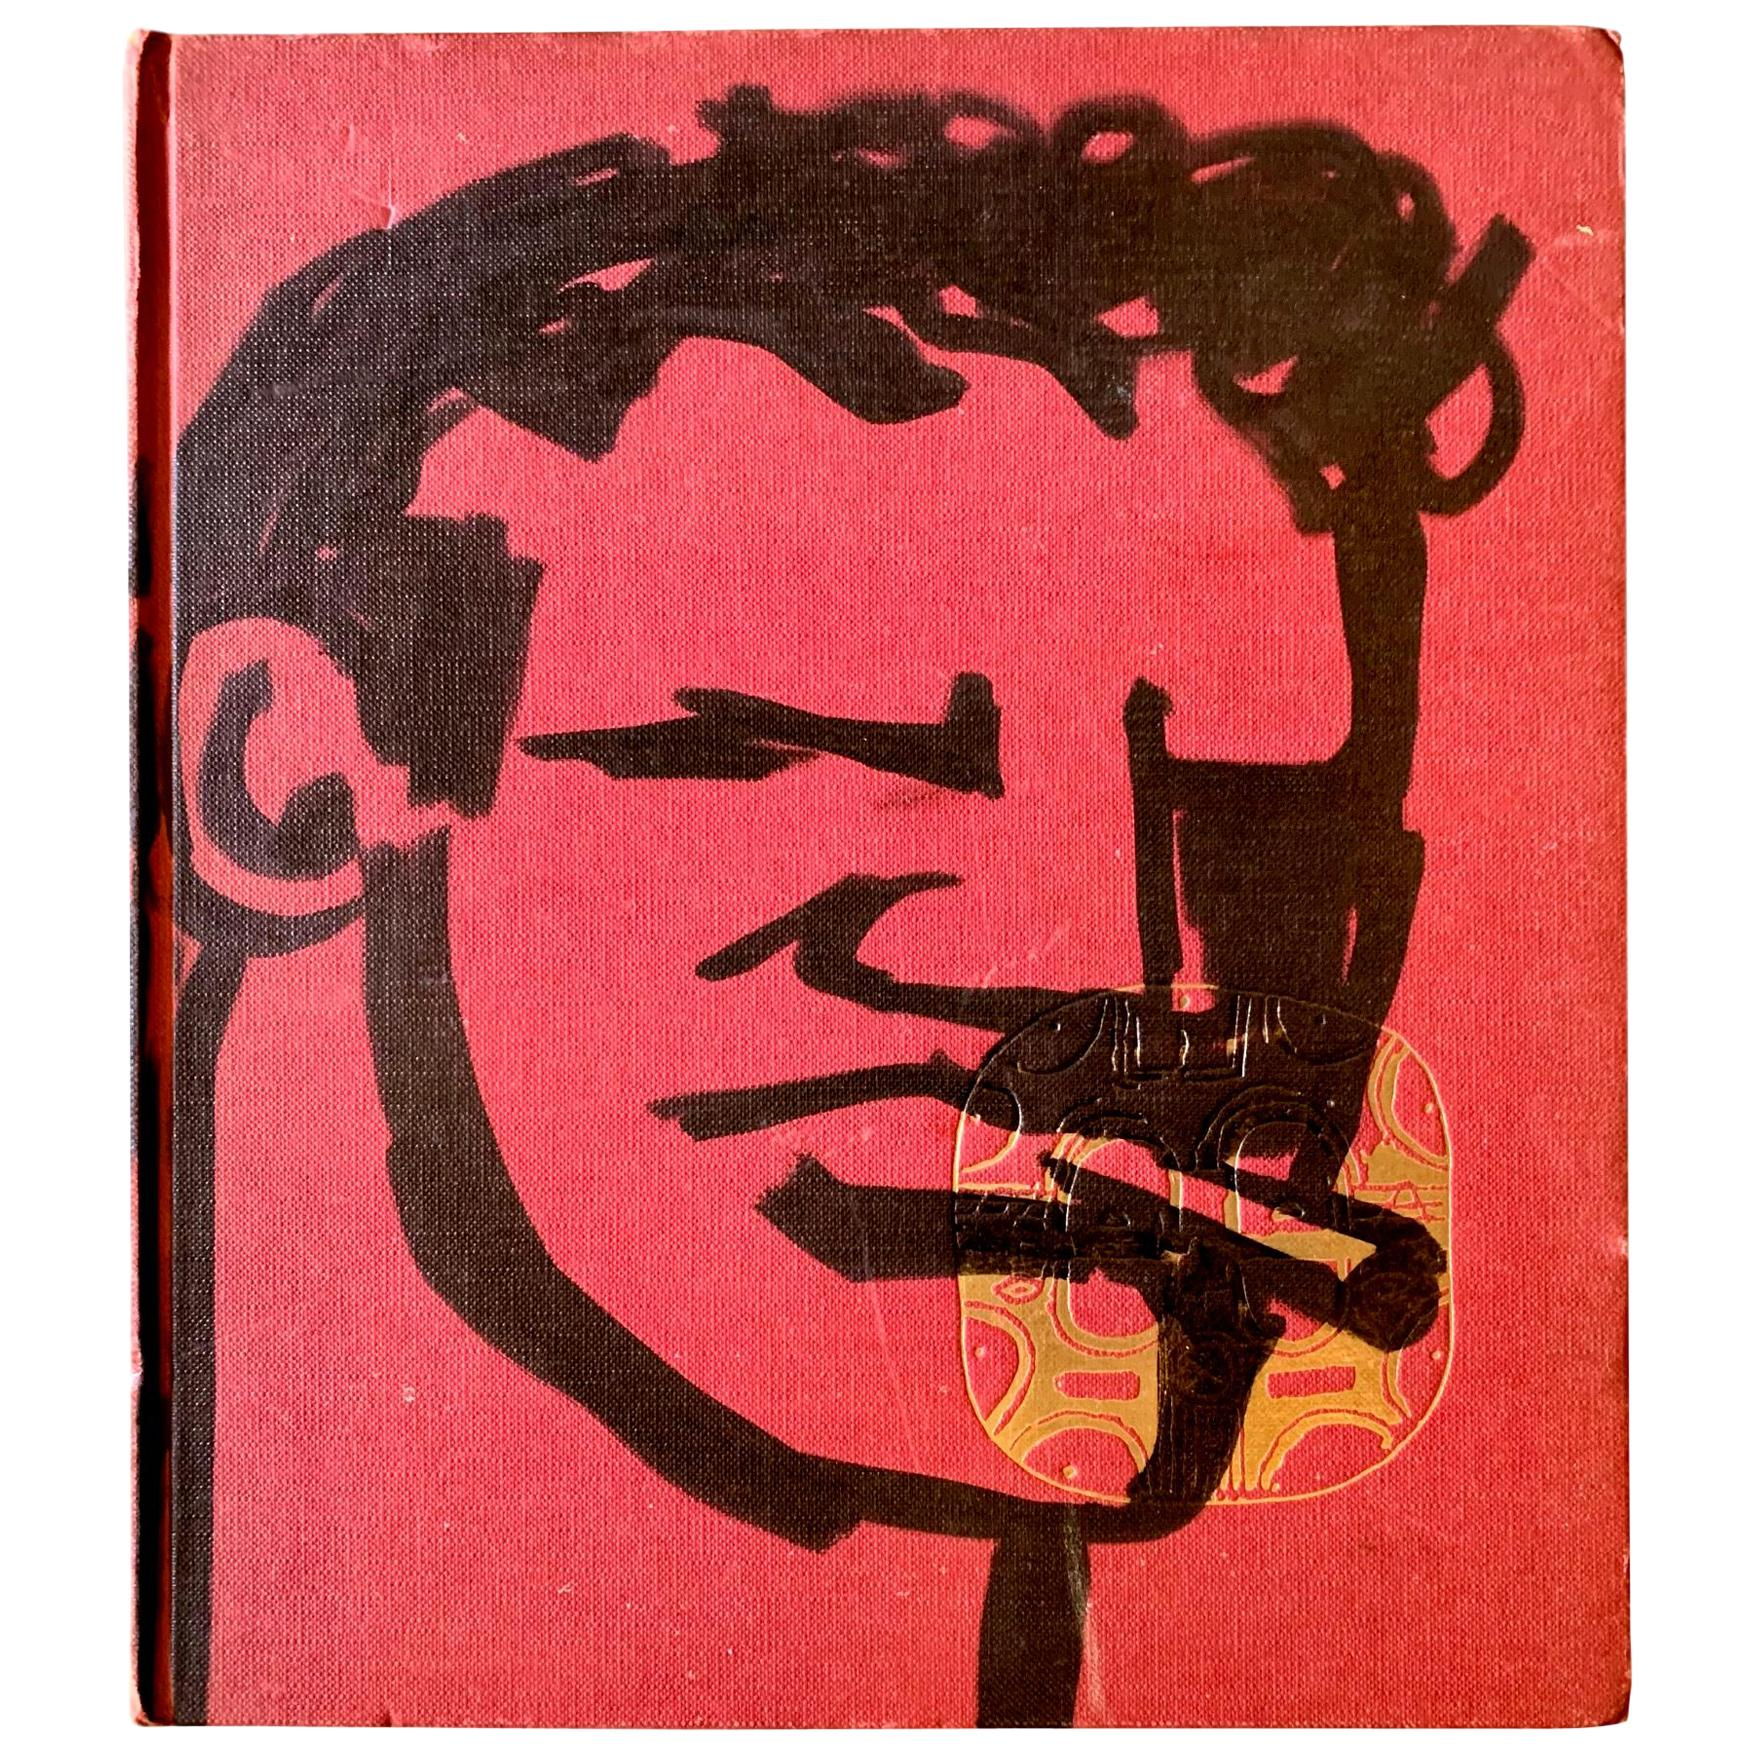 Robert Loughlin Original Drawing on a Book